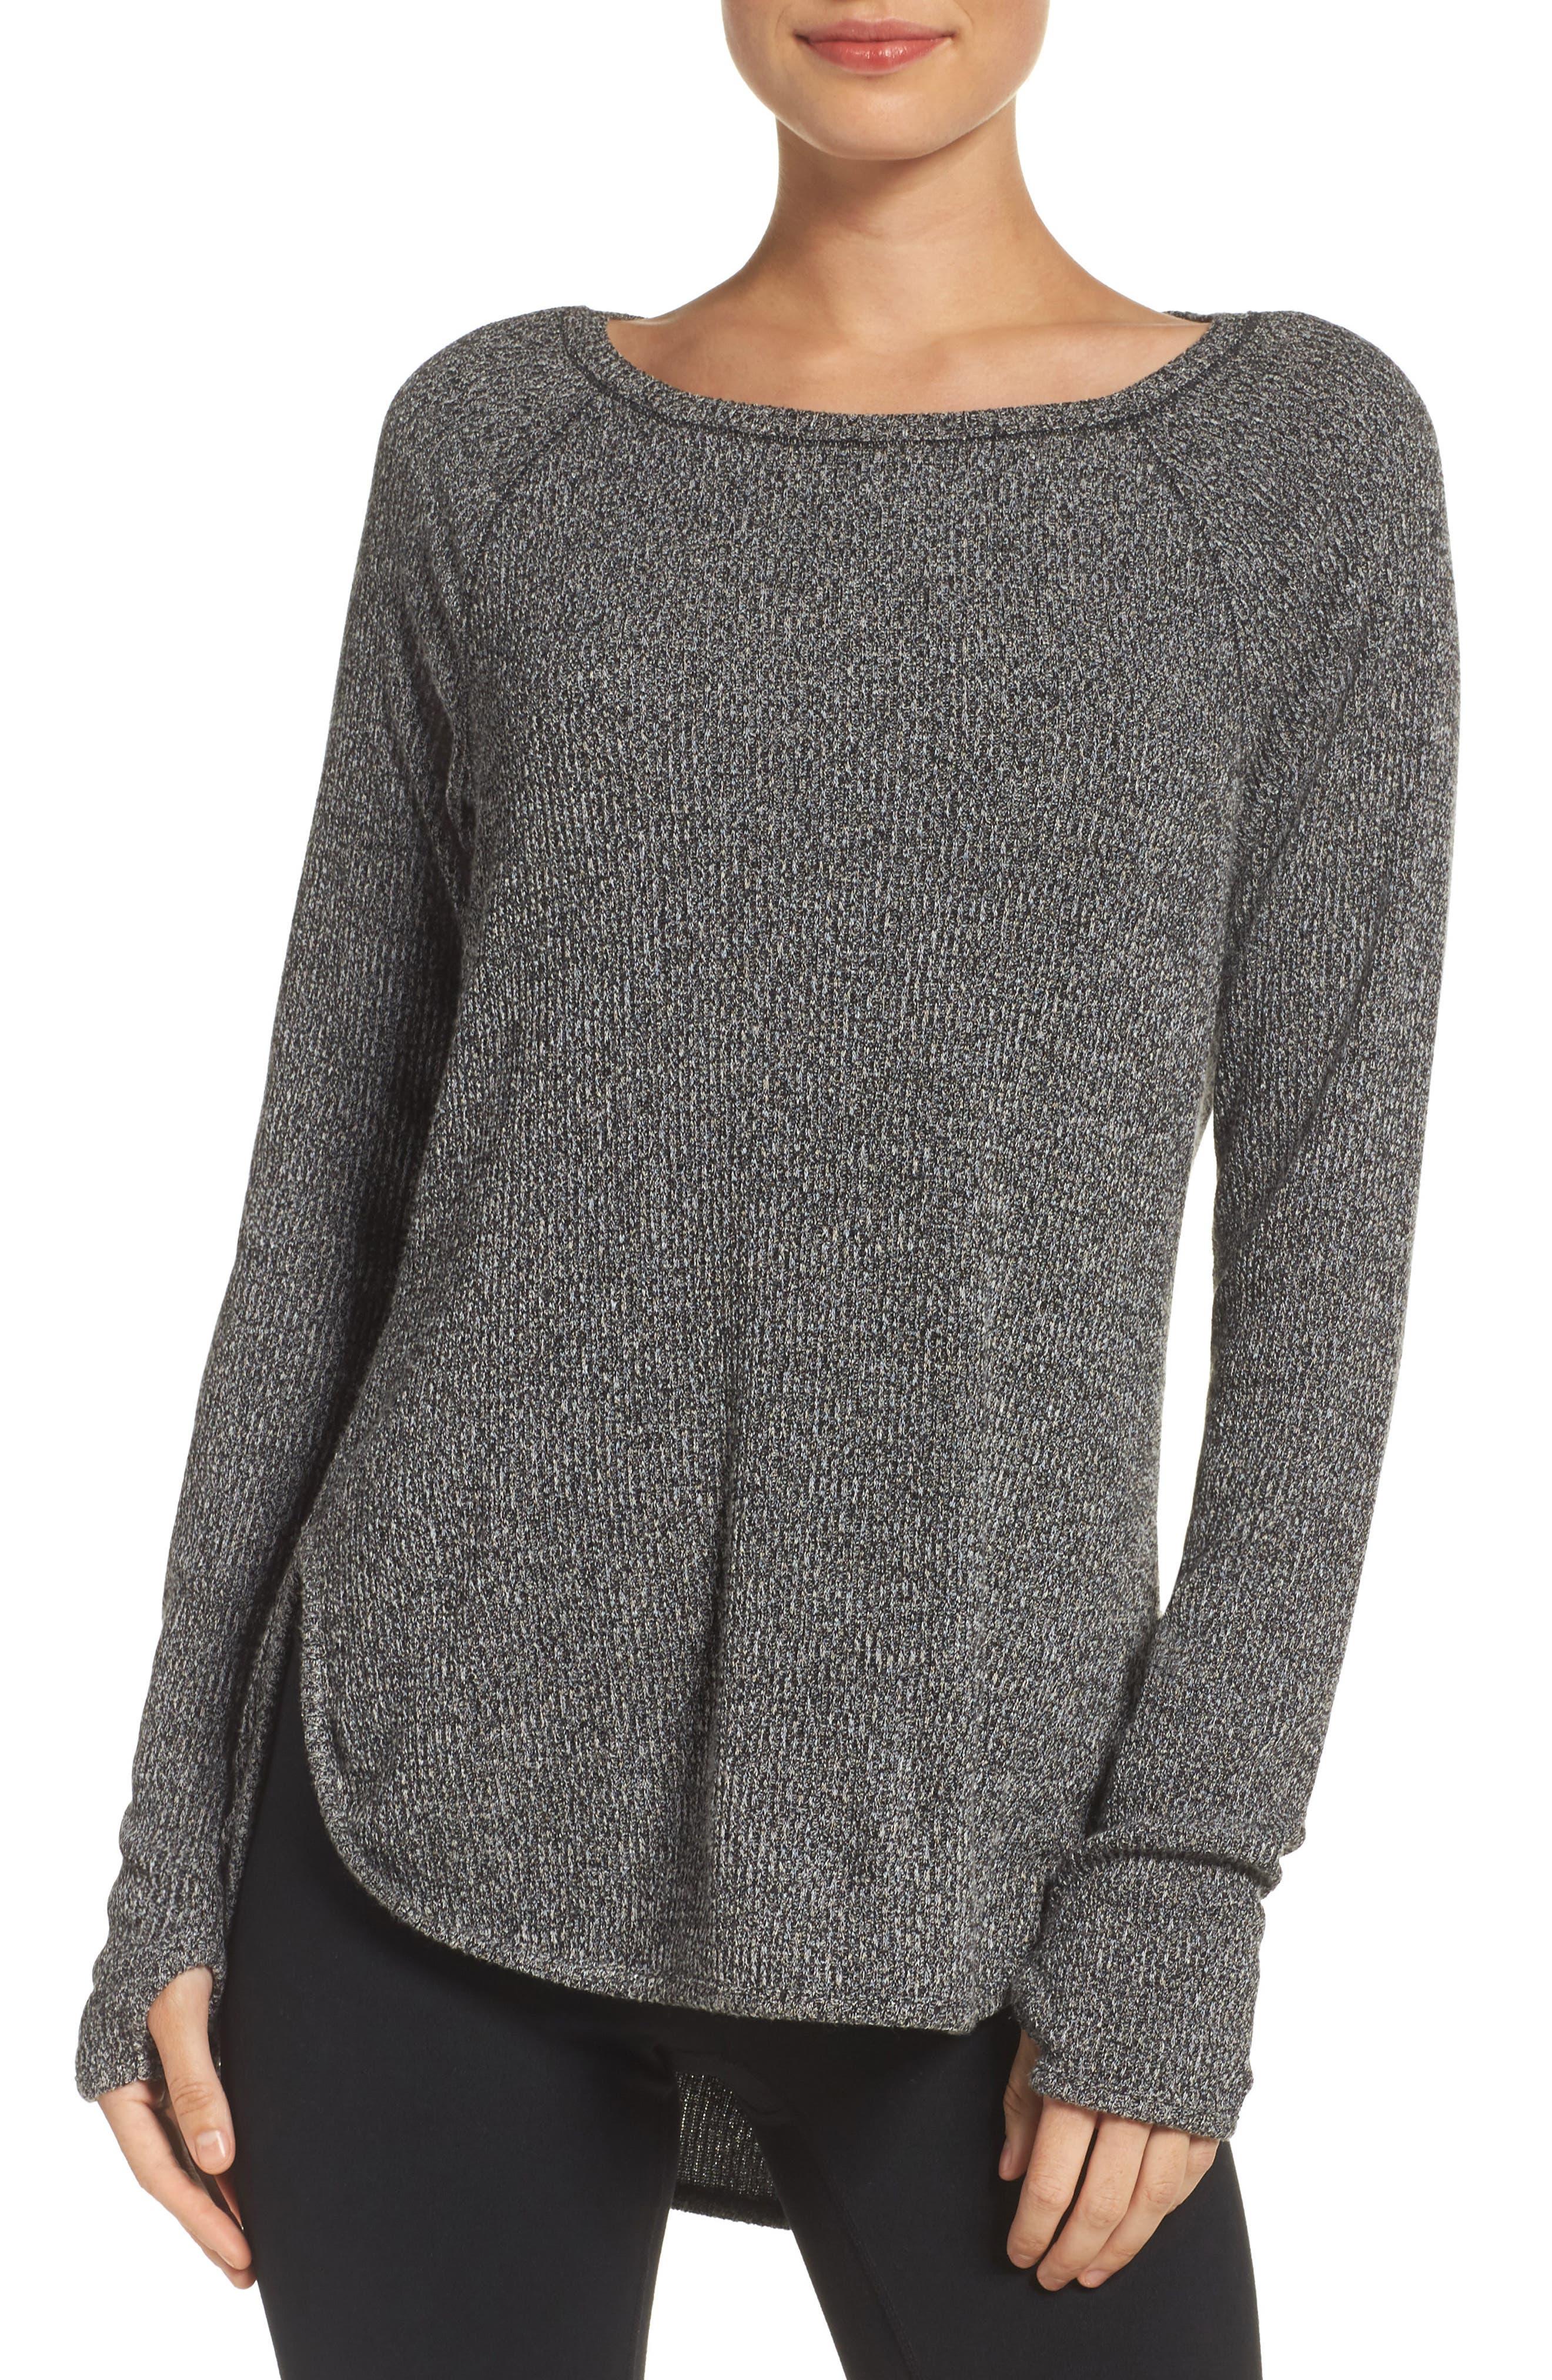 Don't Sweat It Sweater,                         Main,                         color, Black Heather